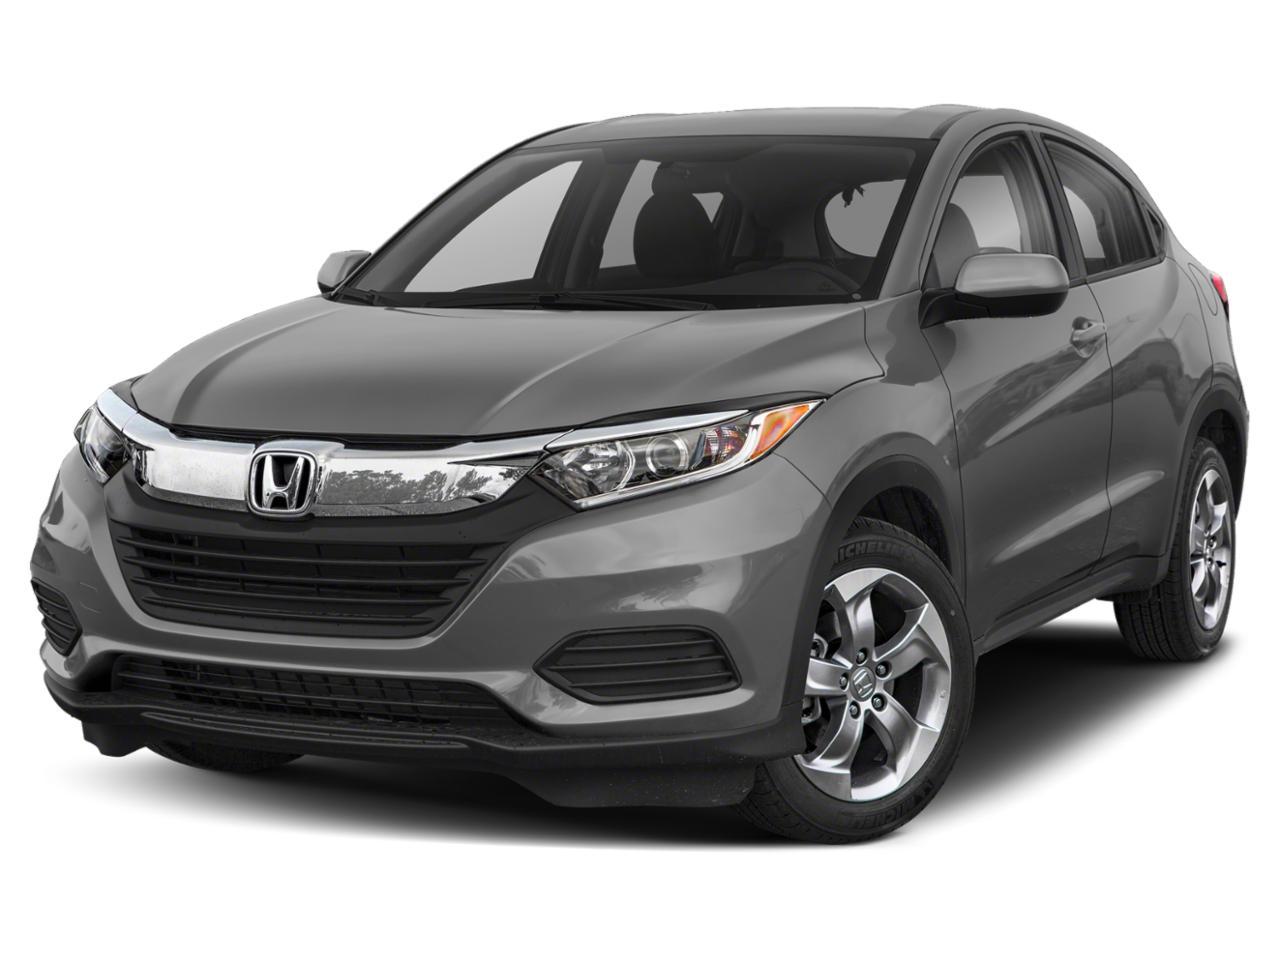 2019 Honda HR-V Vehicle Photo in San Antonio, TX 78238